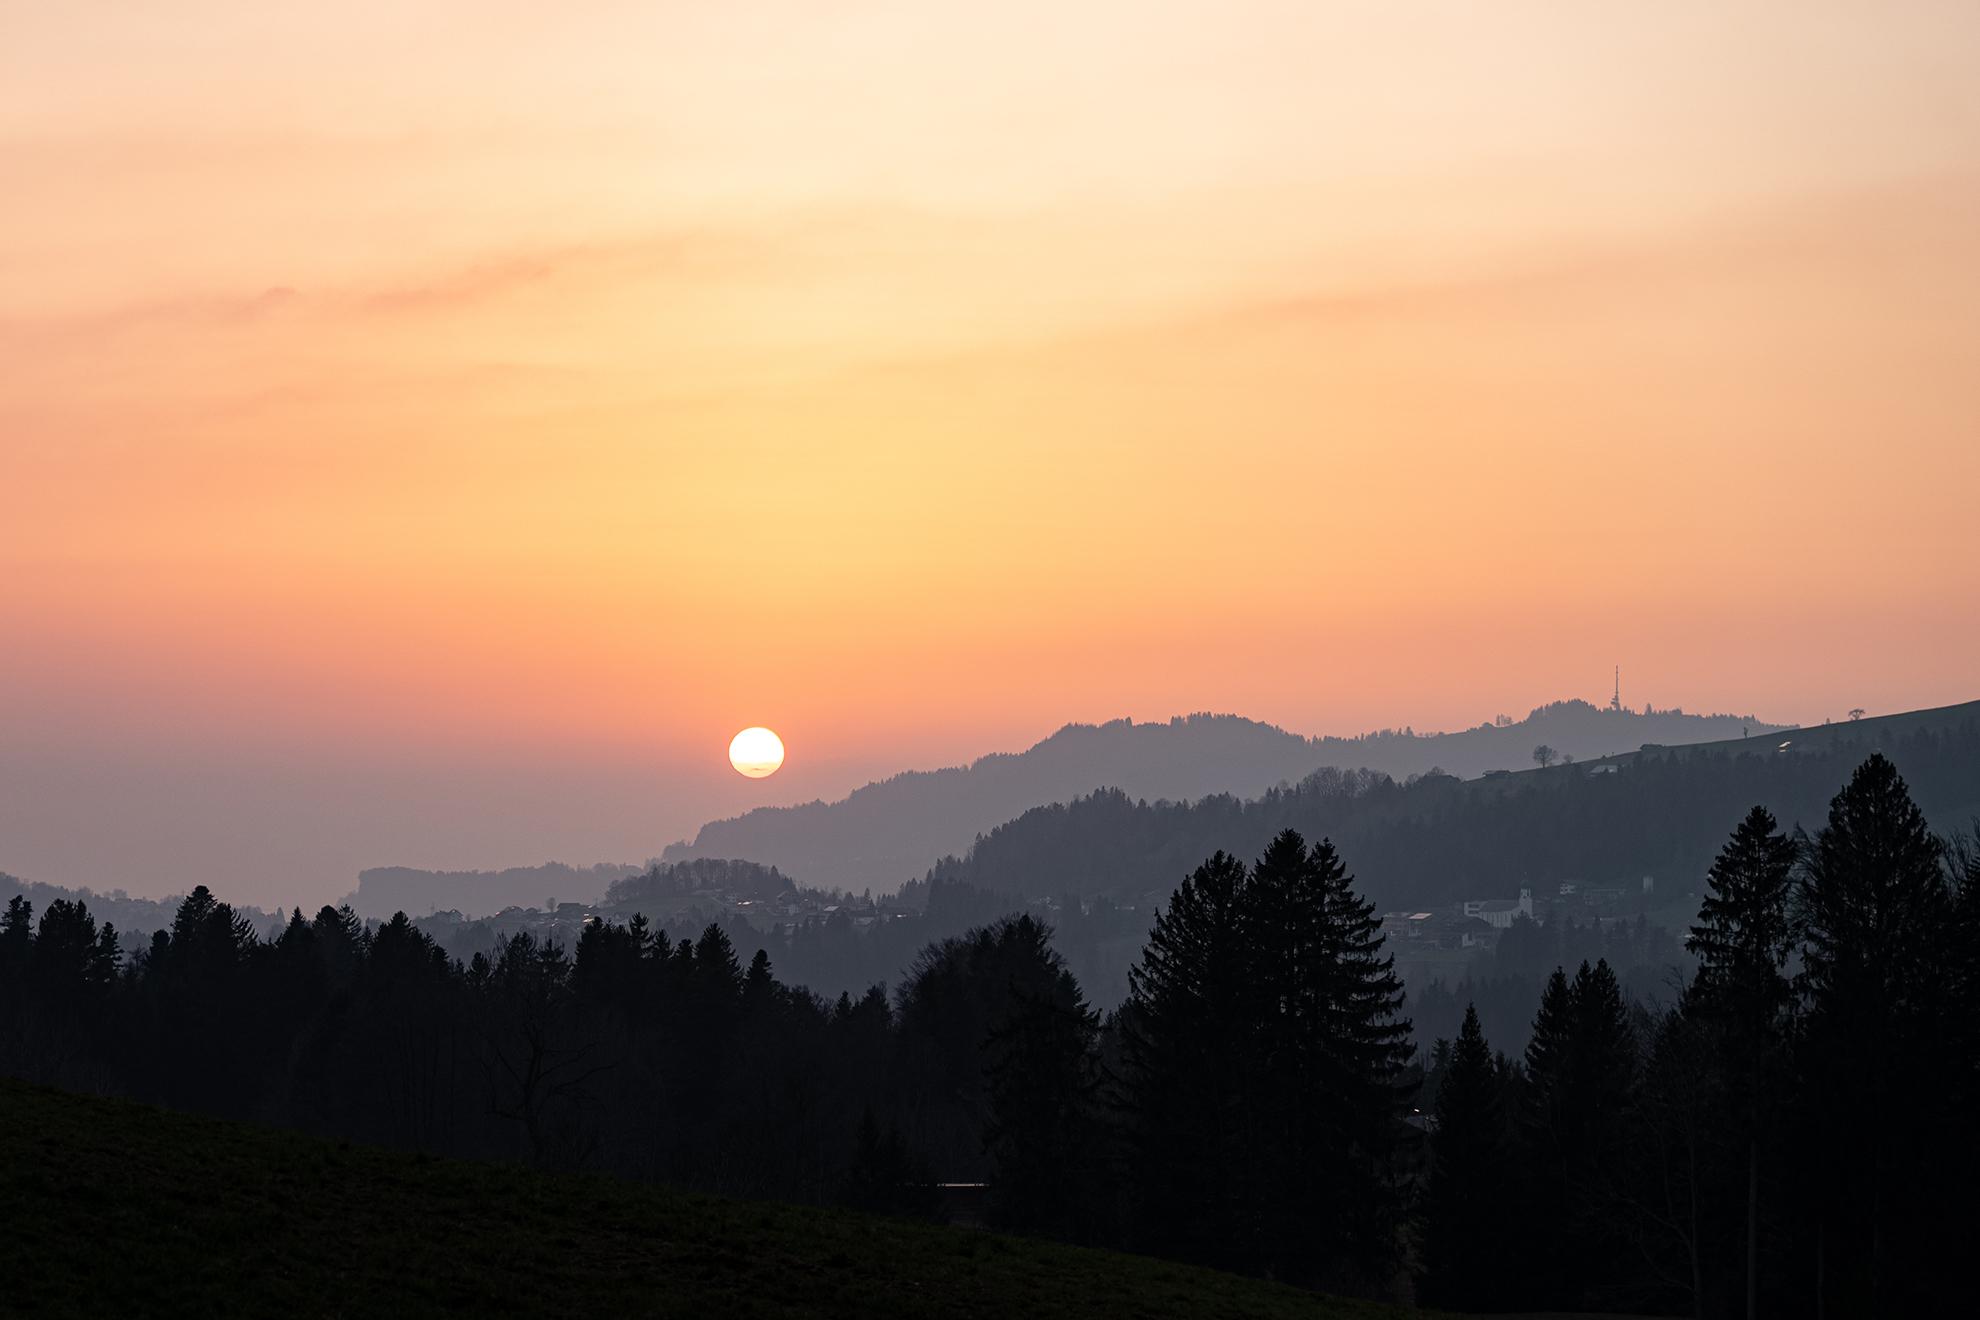 Sonnenuntergang am 28. März 2020